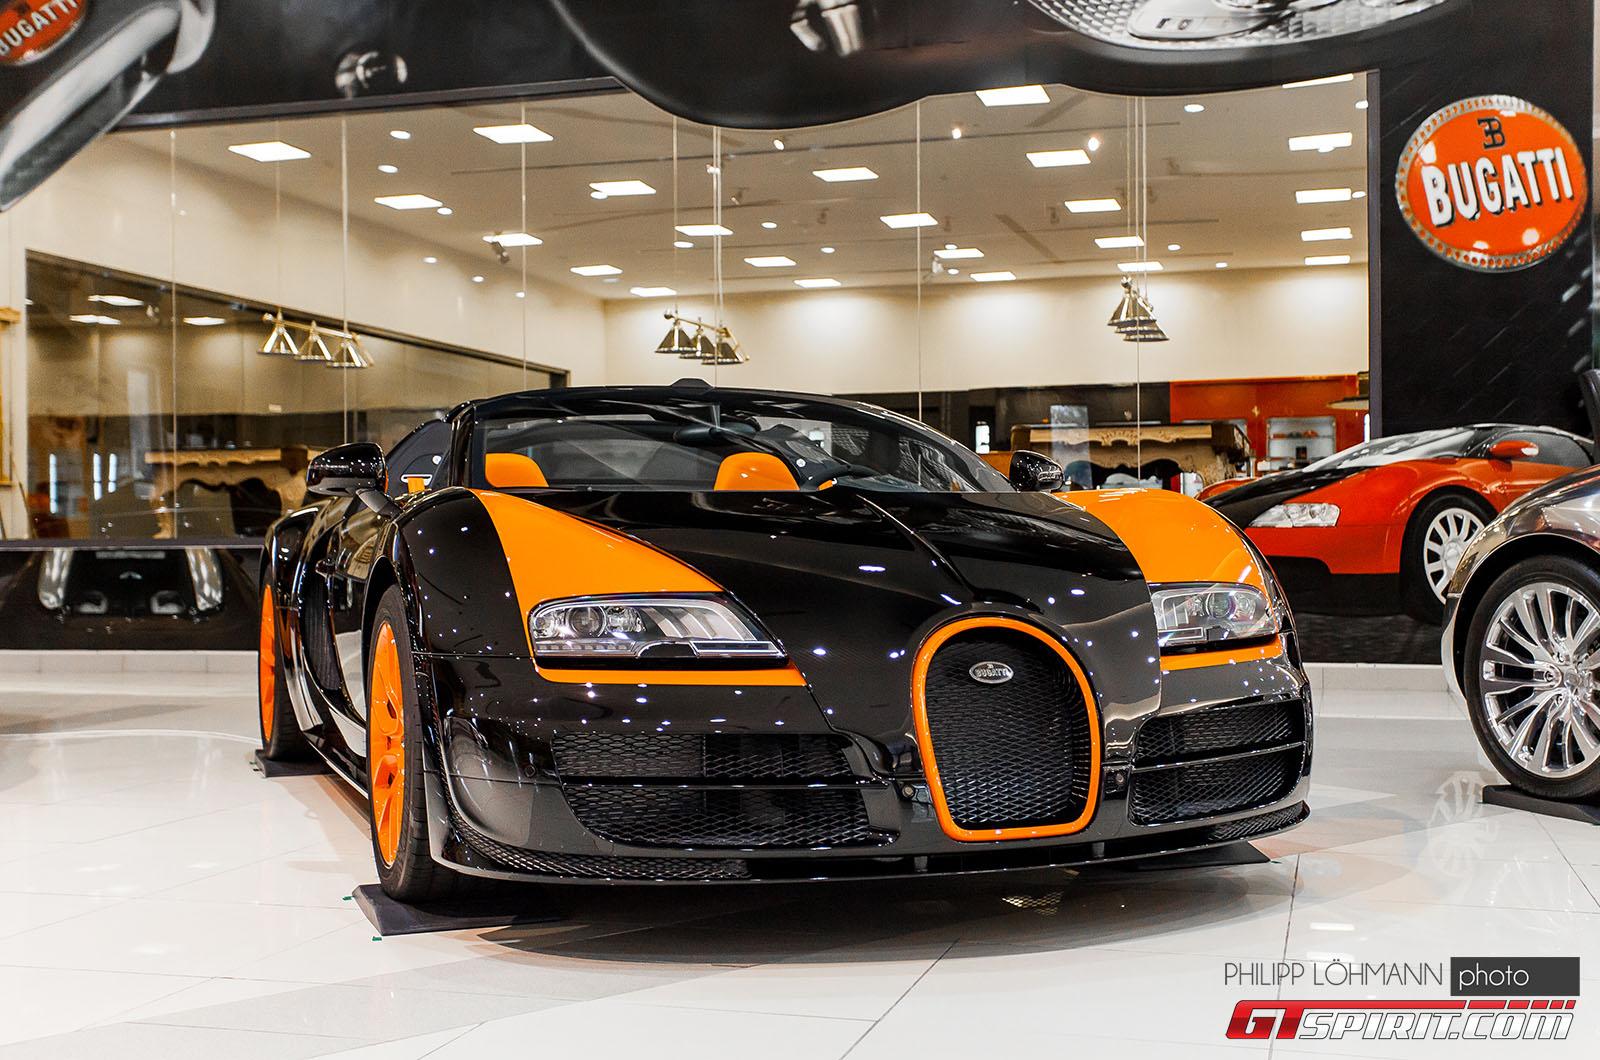 Гараж мечты в Абу-Даби. Bugatti Veyron